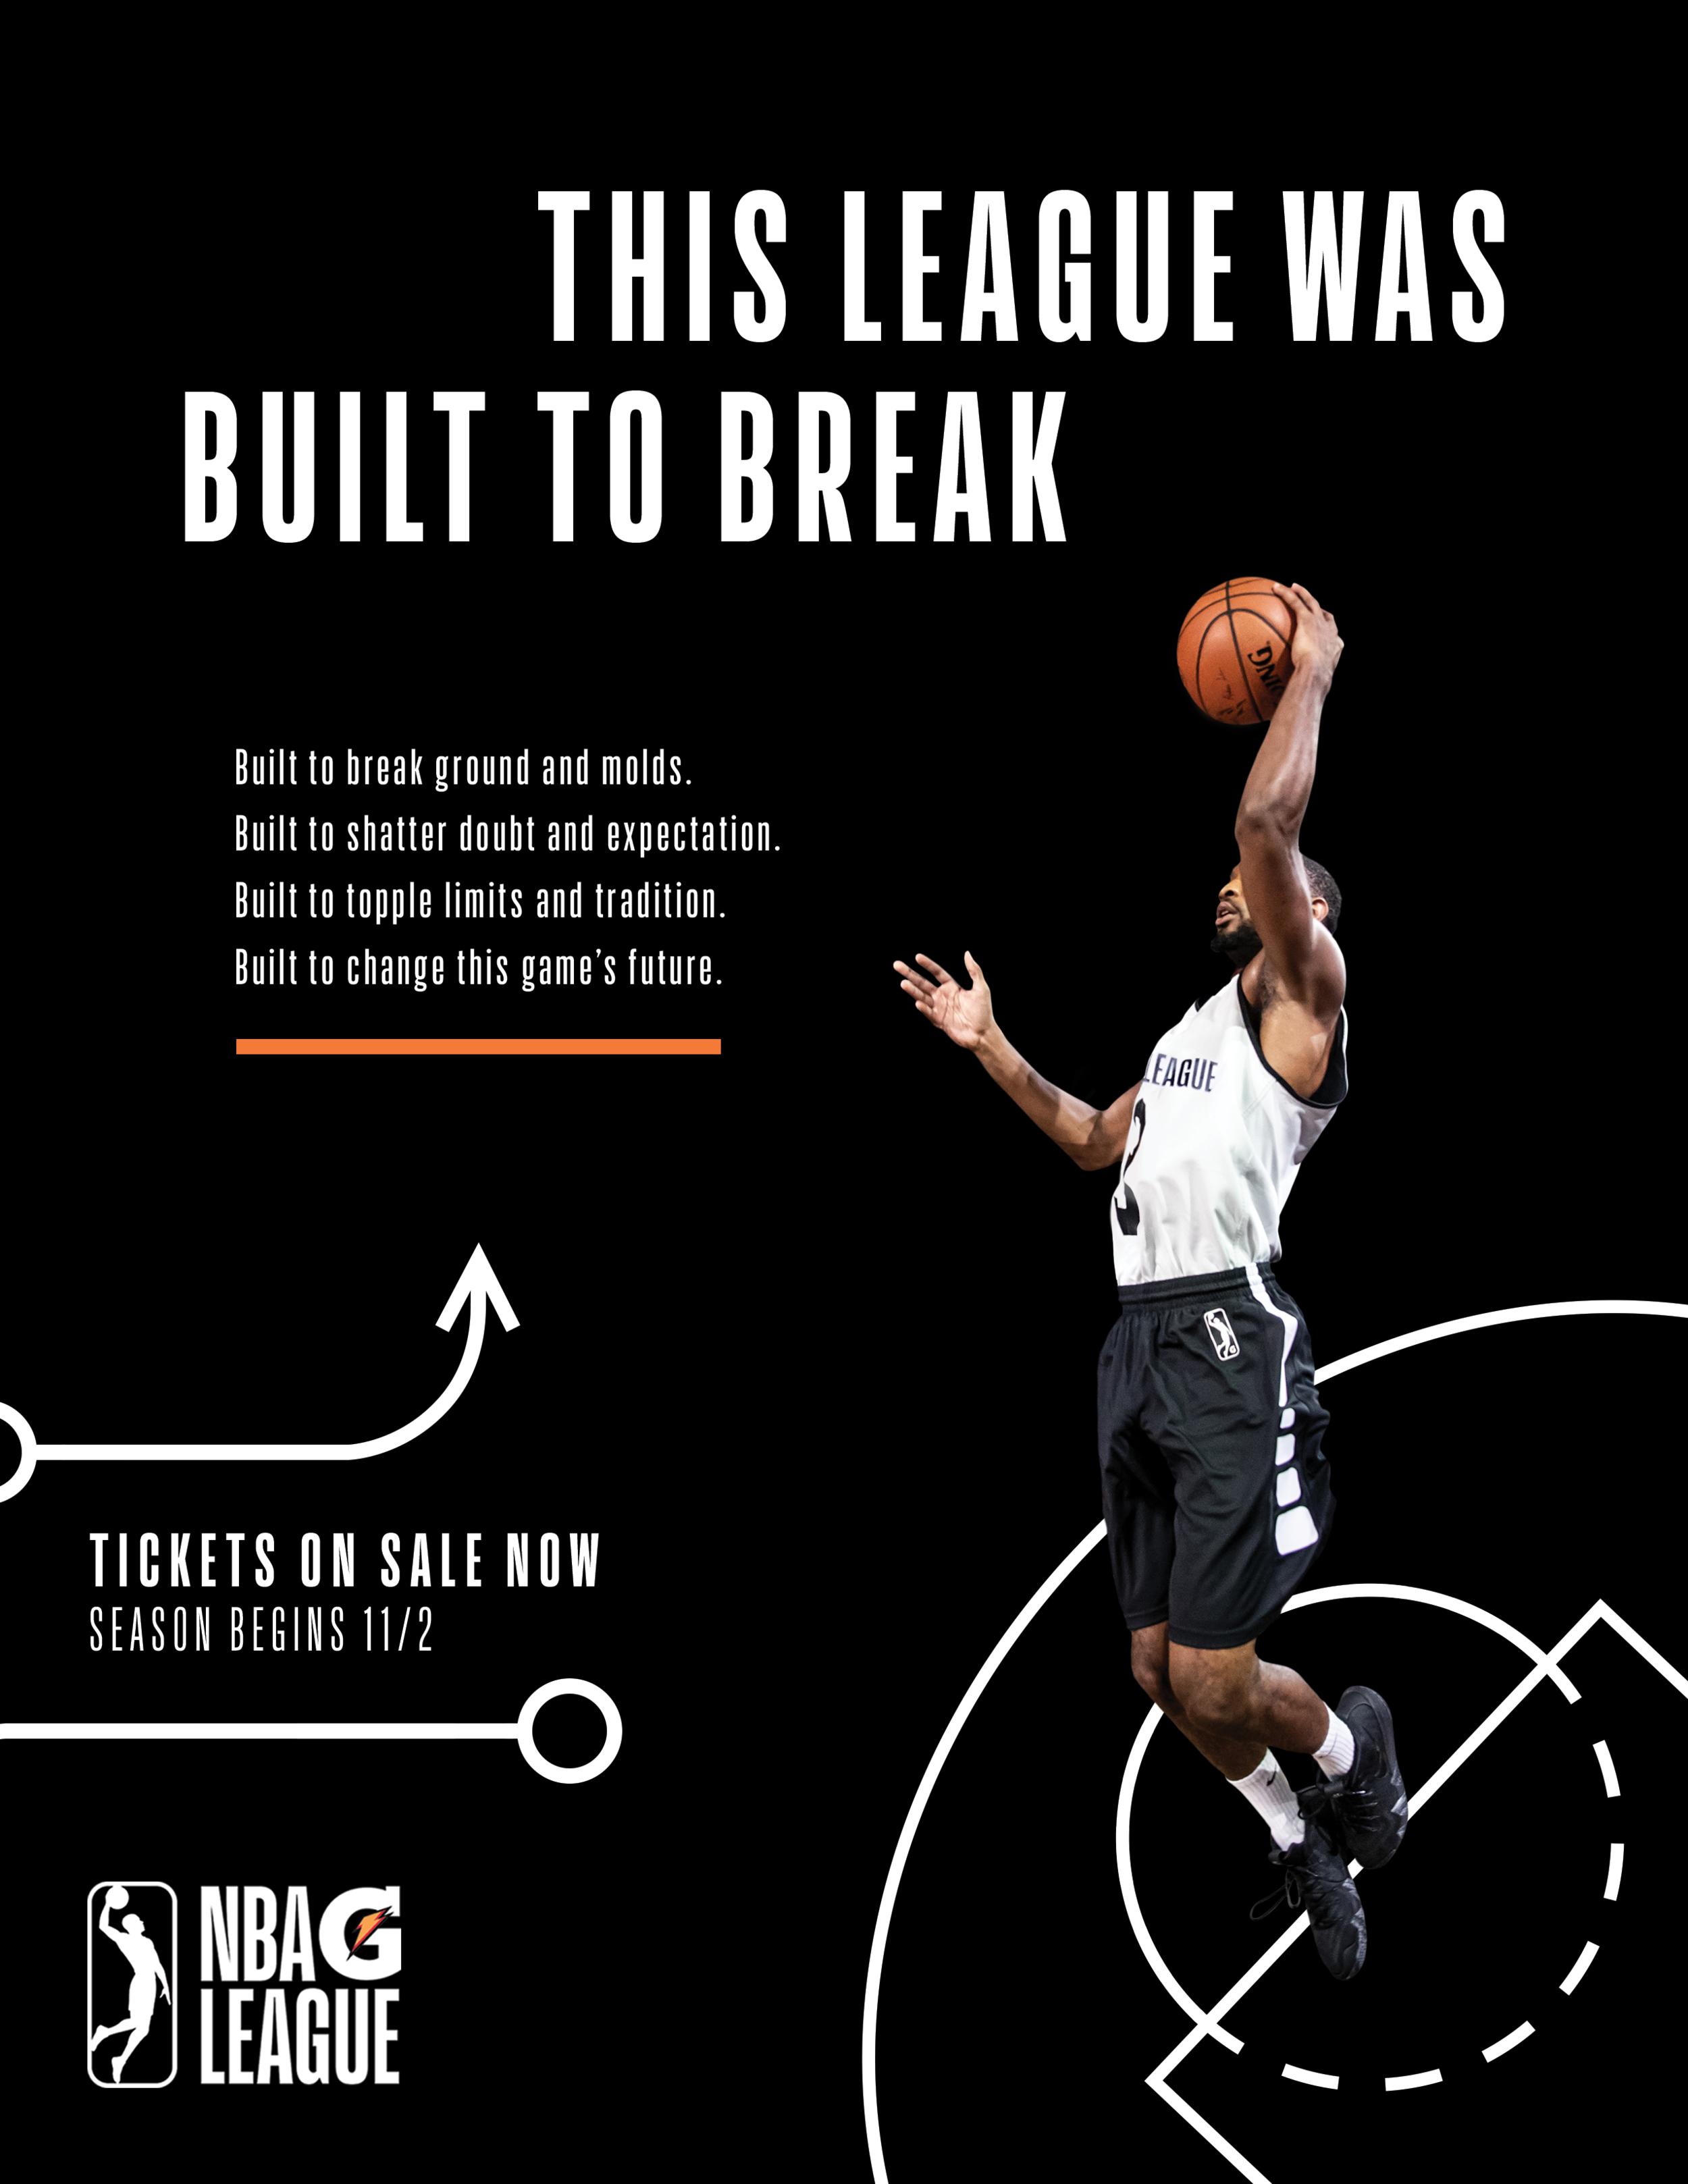 NBAGLeague_PrintAd_League.png